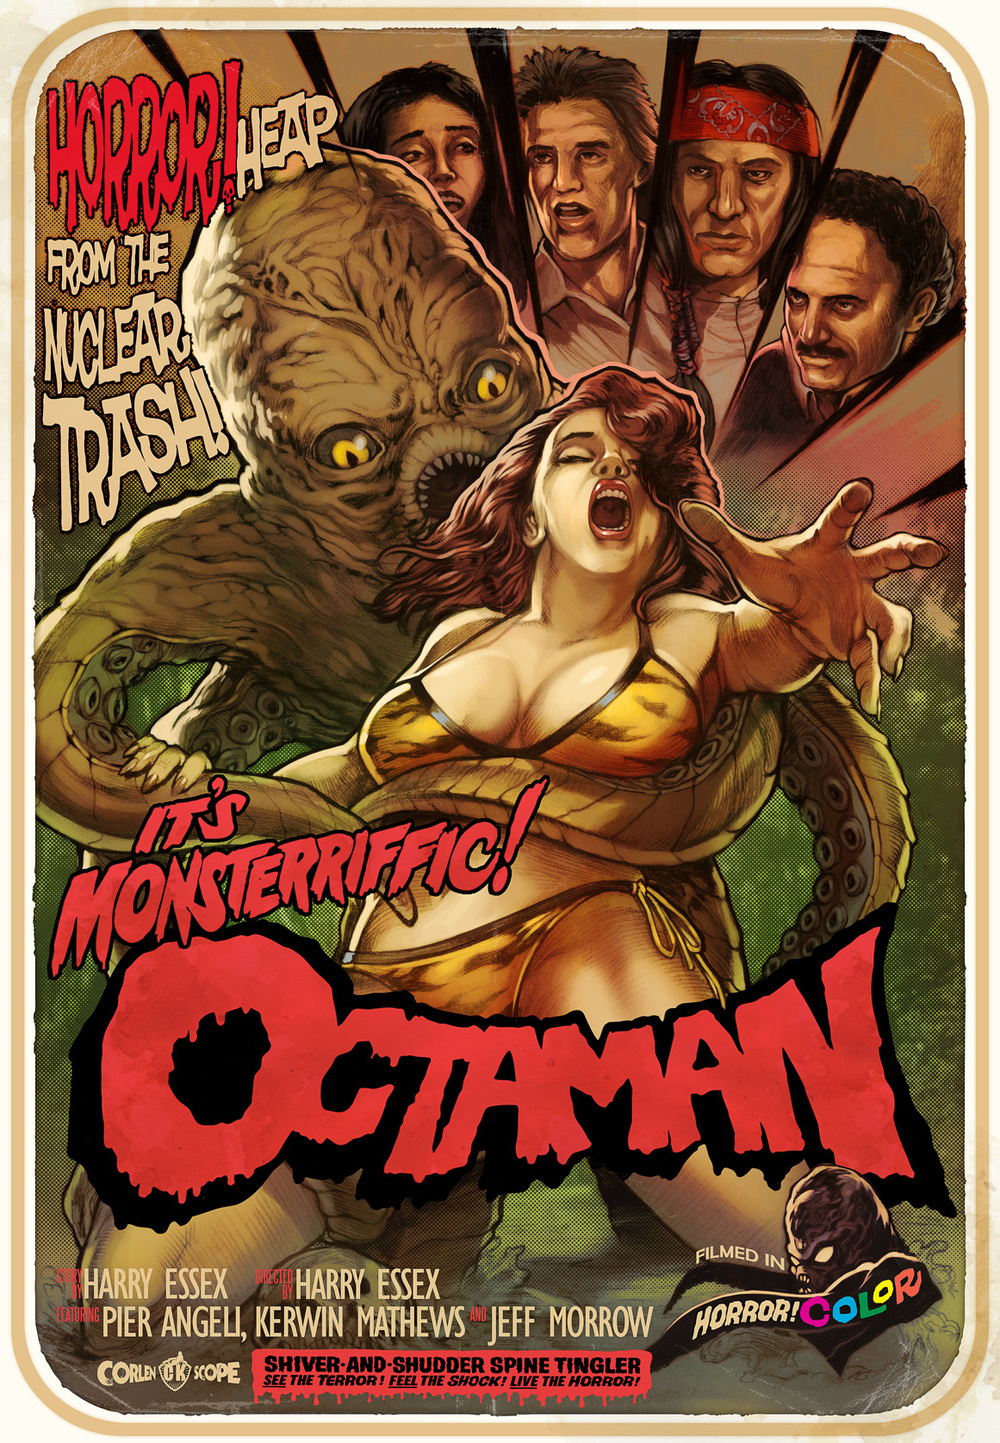 octaman_poster_by_wacomzombie-d374xra.jpg